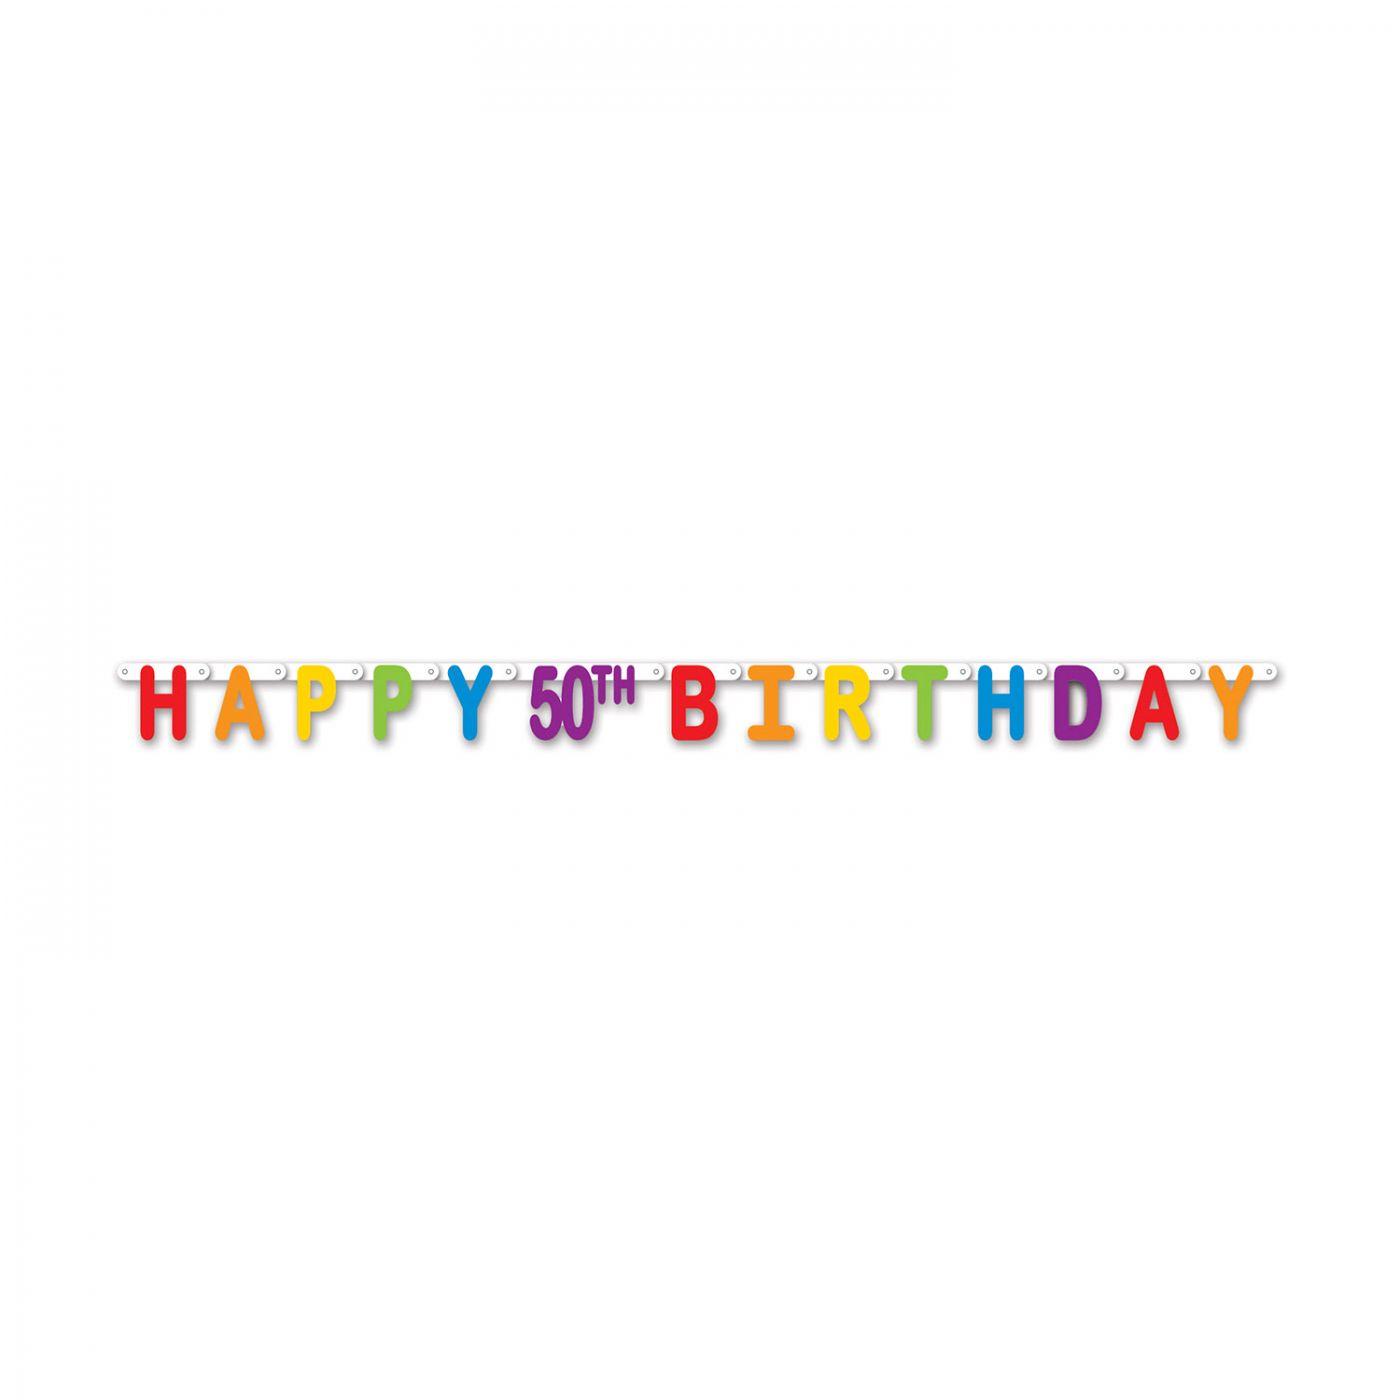 Happy 50th Birthday Streamer image